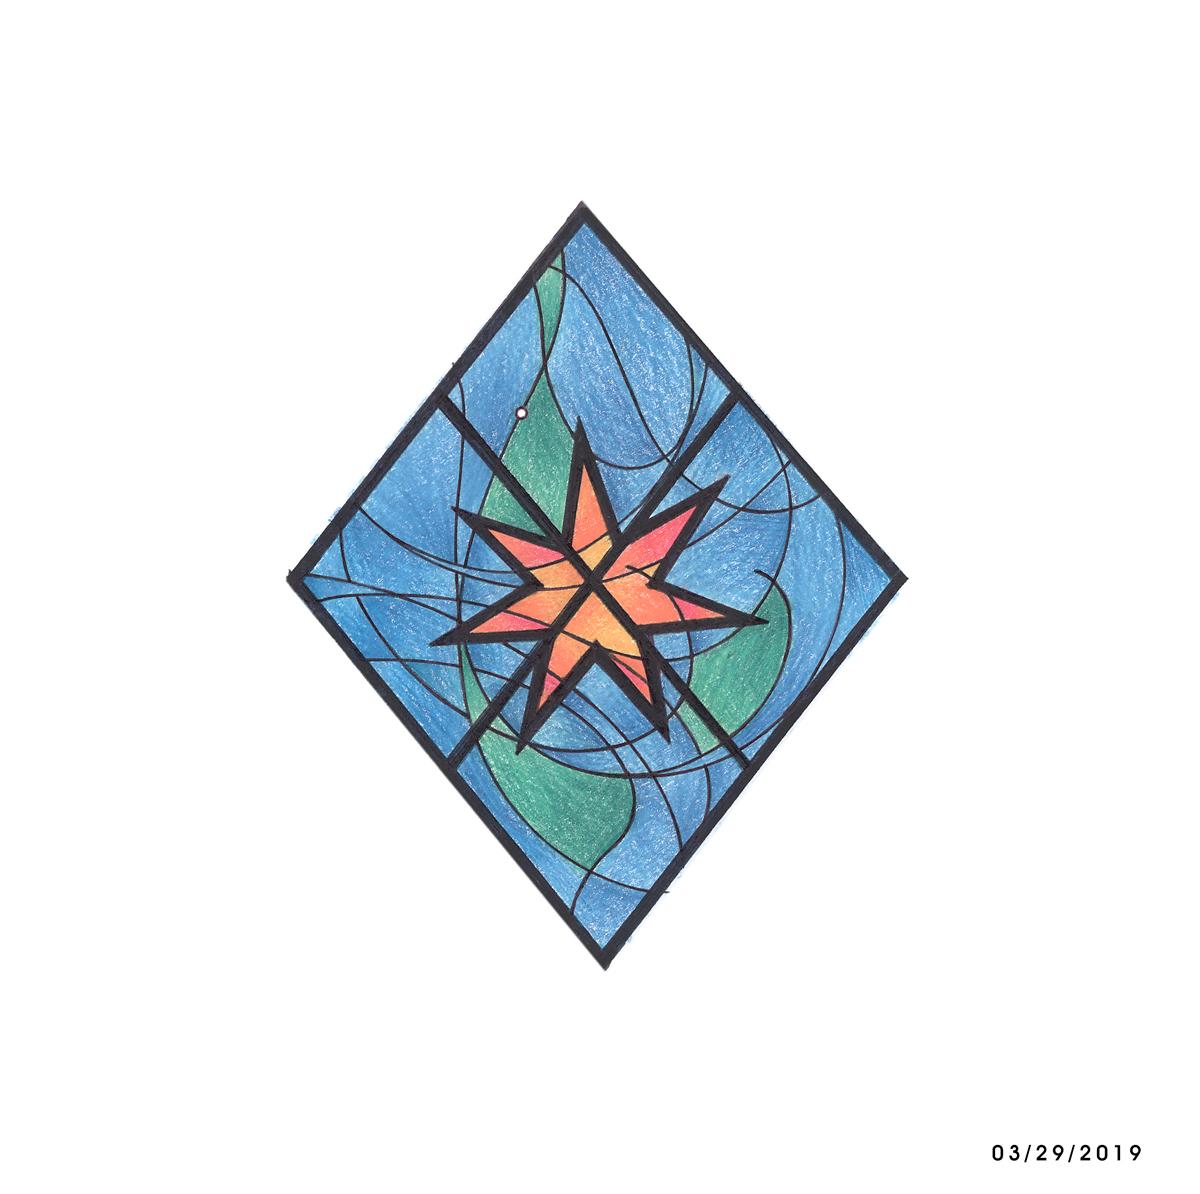 Diamond Window - Final Design